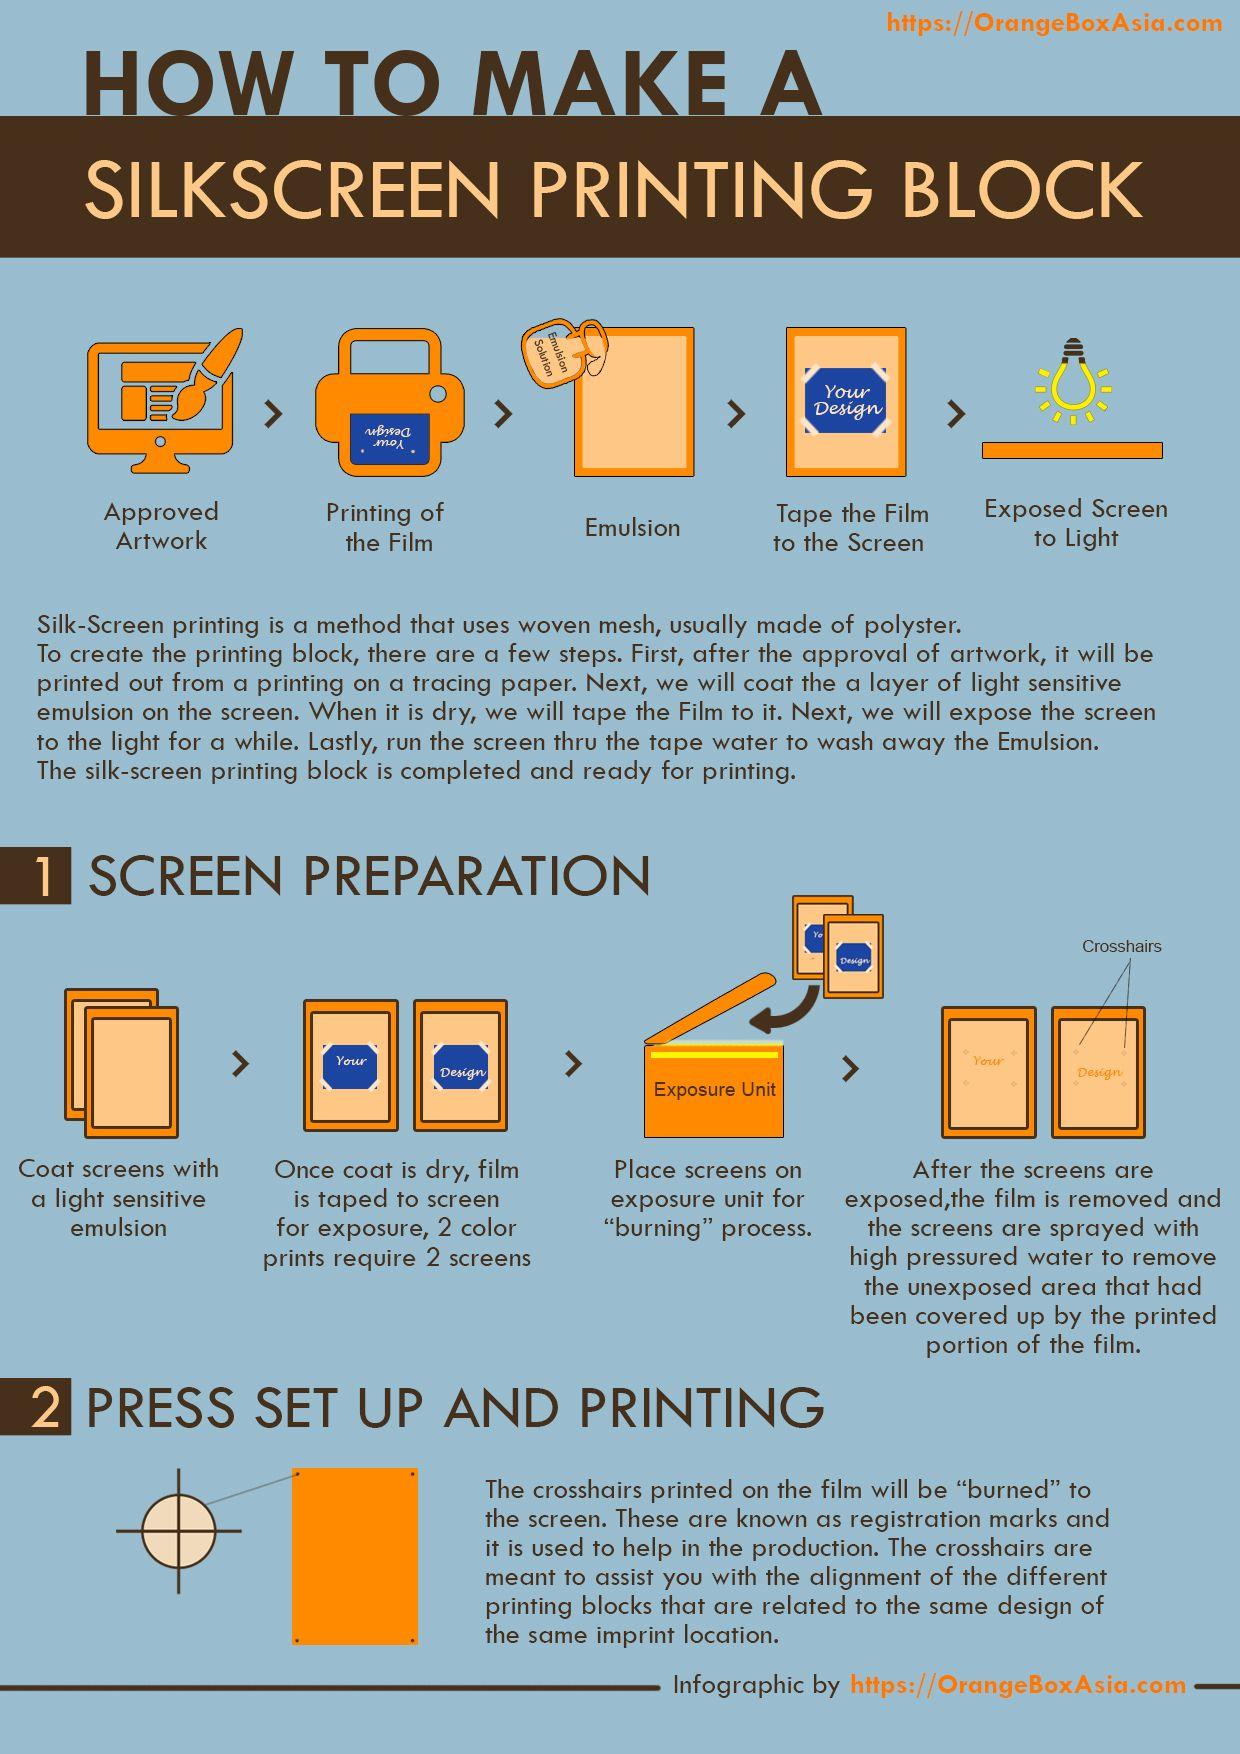 e4e008d4 silkscreen-printing-services-infographic | OrangeBox - T-Shirt ...